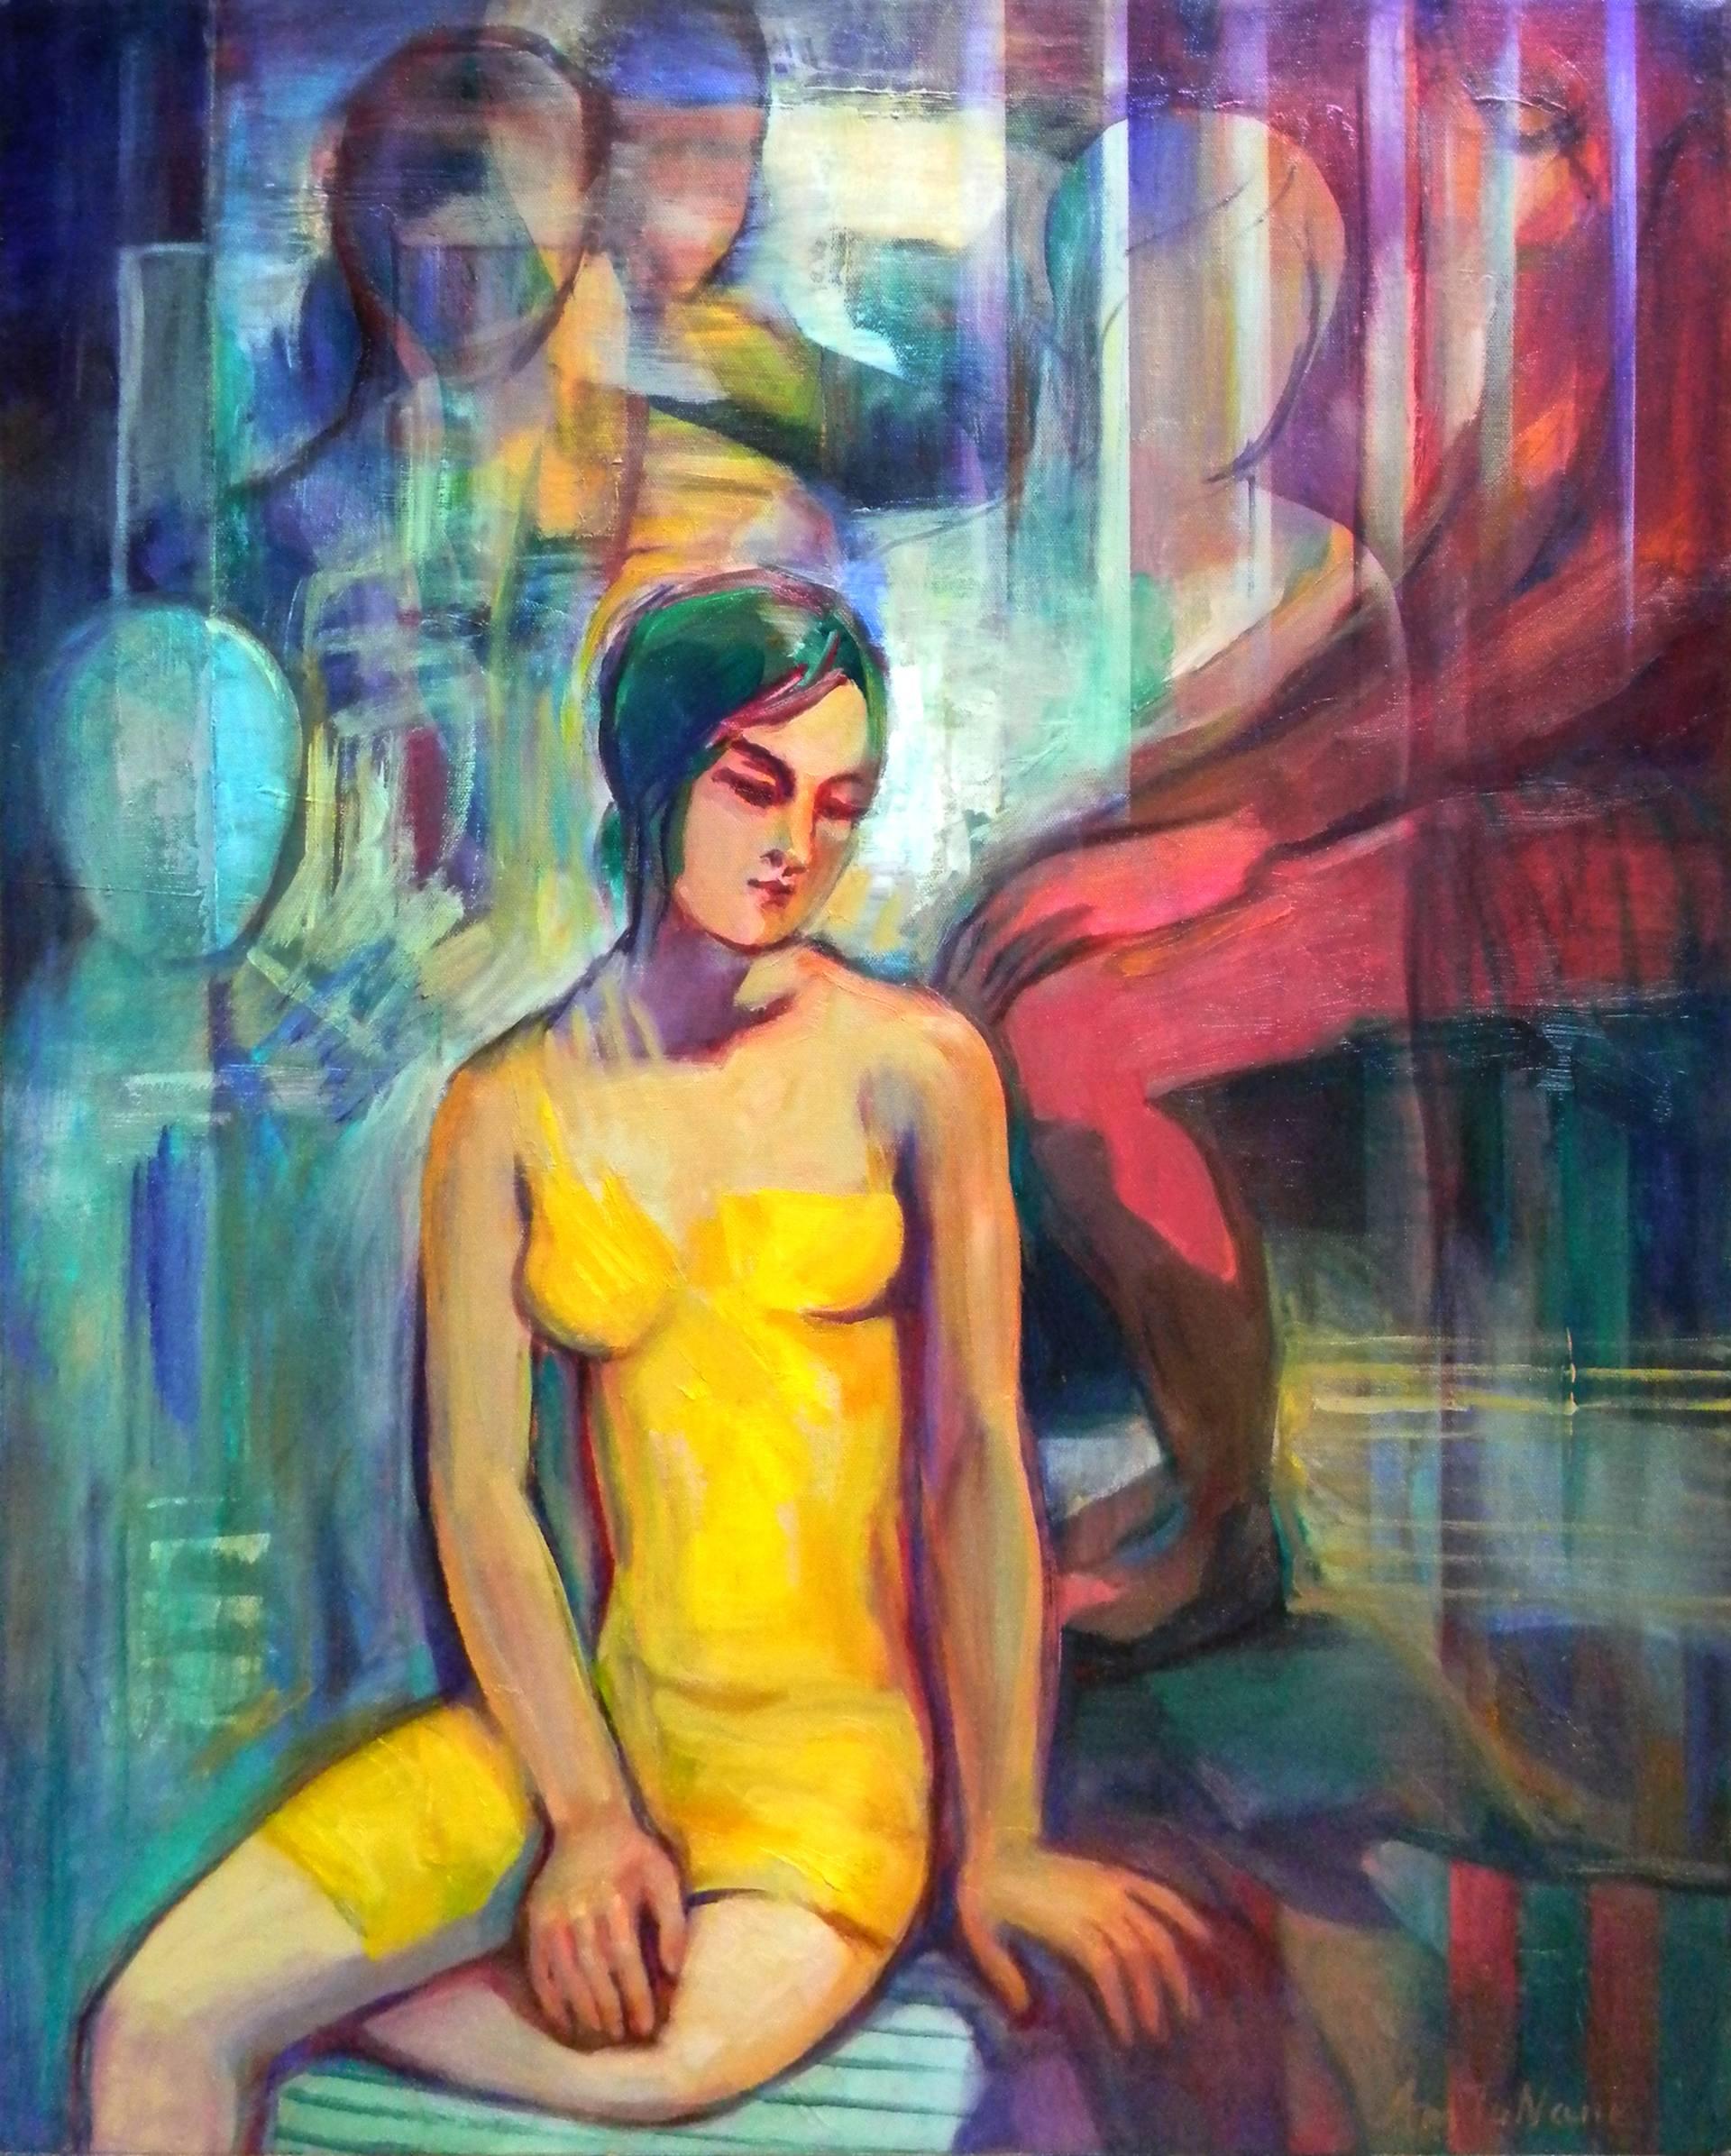 Risultati immagini per Silence Painting, 30 H x 24 W x 1 in Amalya Nane Tumanian